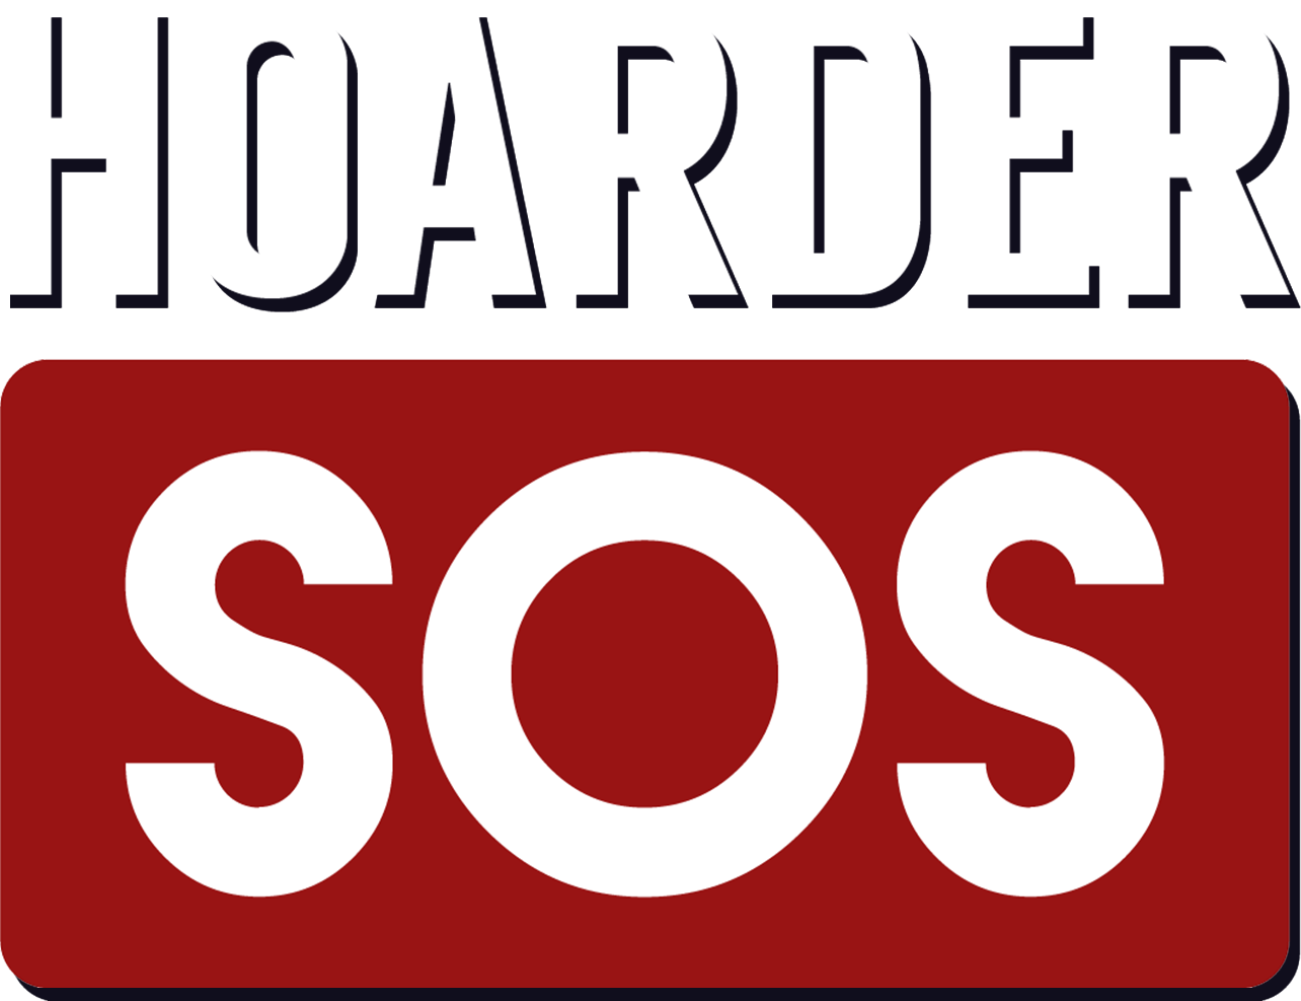 Hoarder SOS